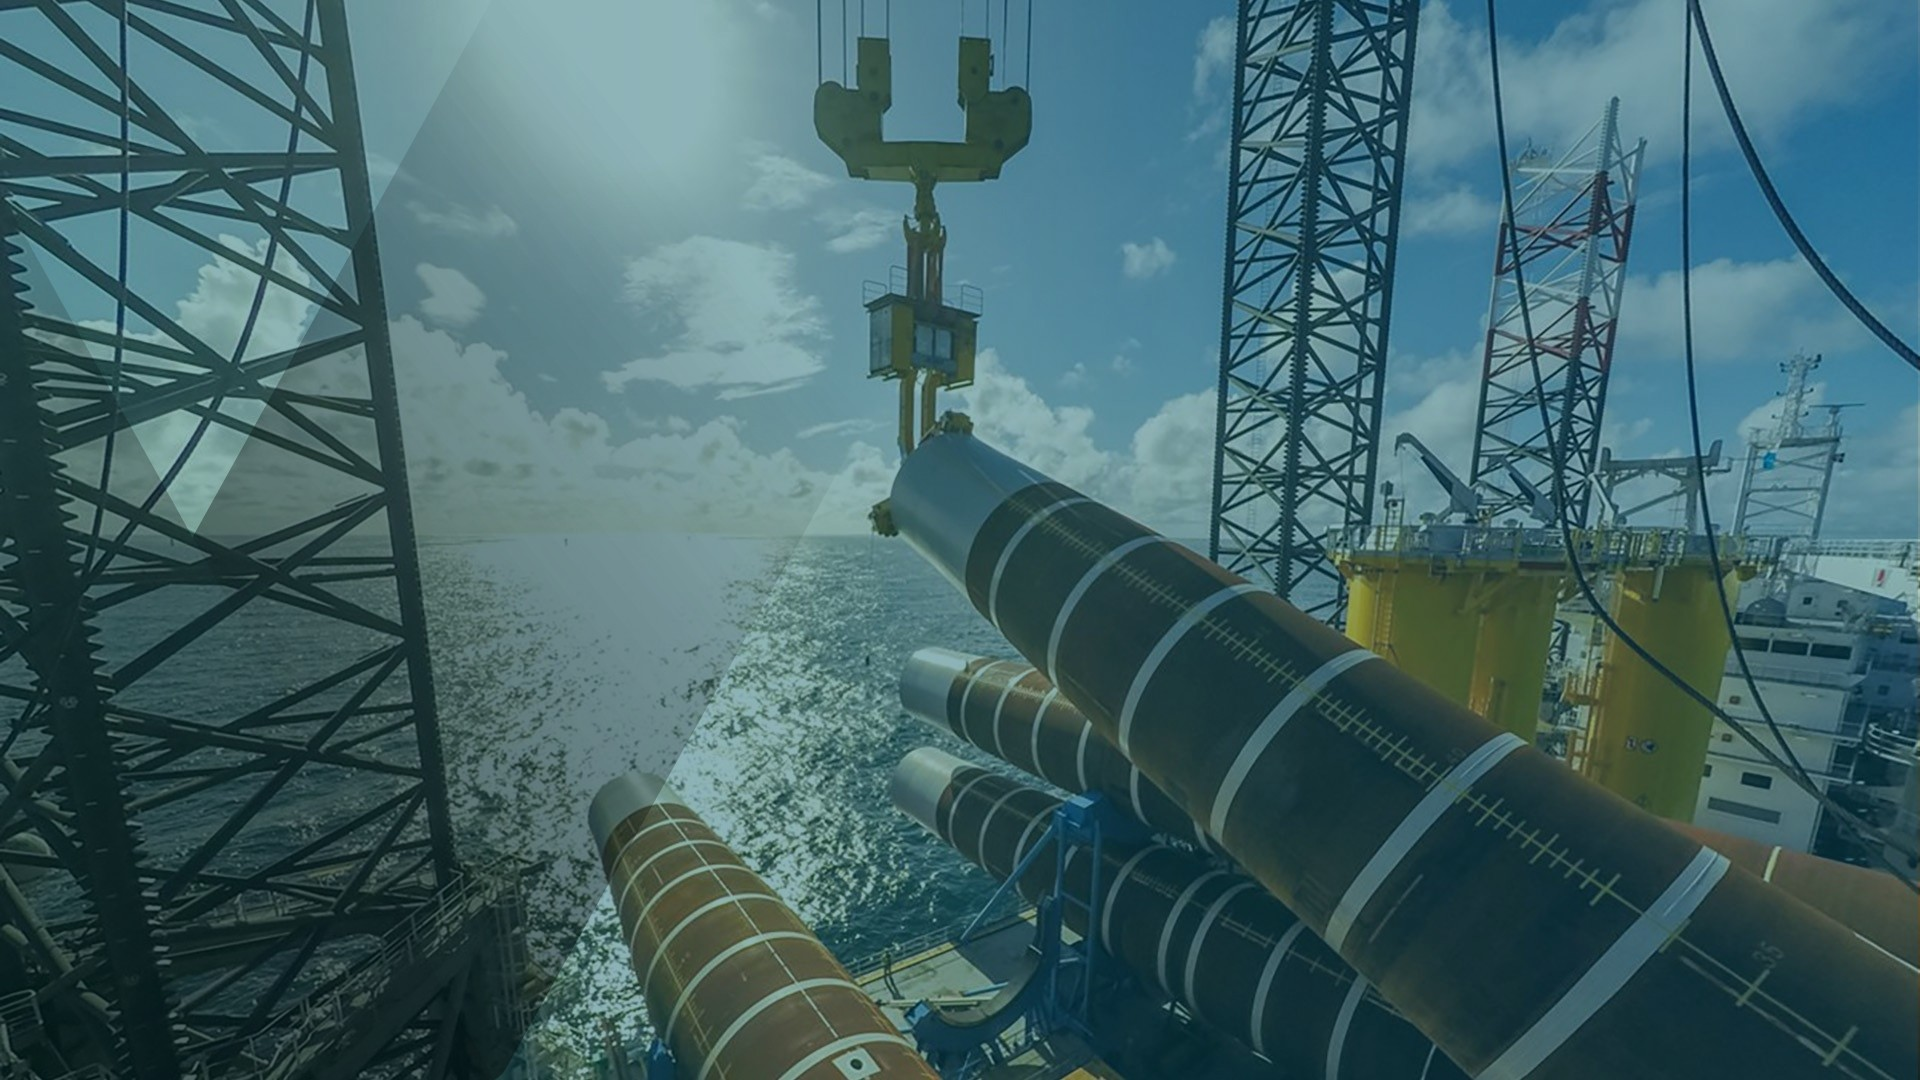 Image: Operational Engineering